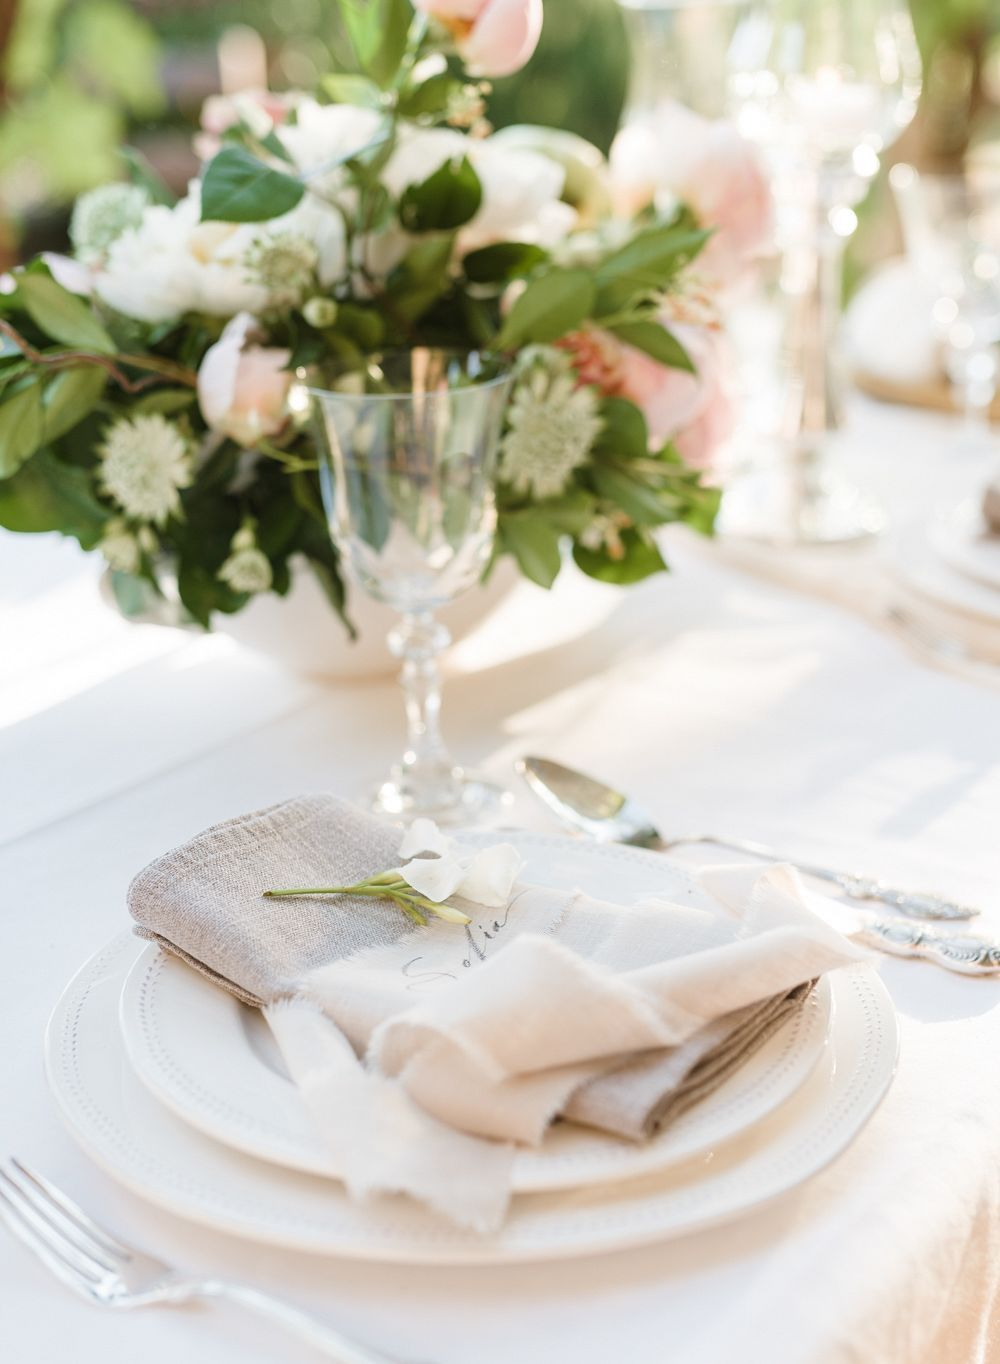 Sun Drenched Destination Wedding in Tuscany | Первый вариант свадьбы ...